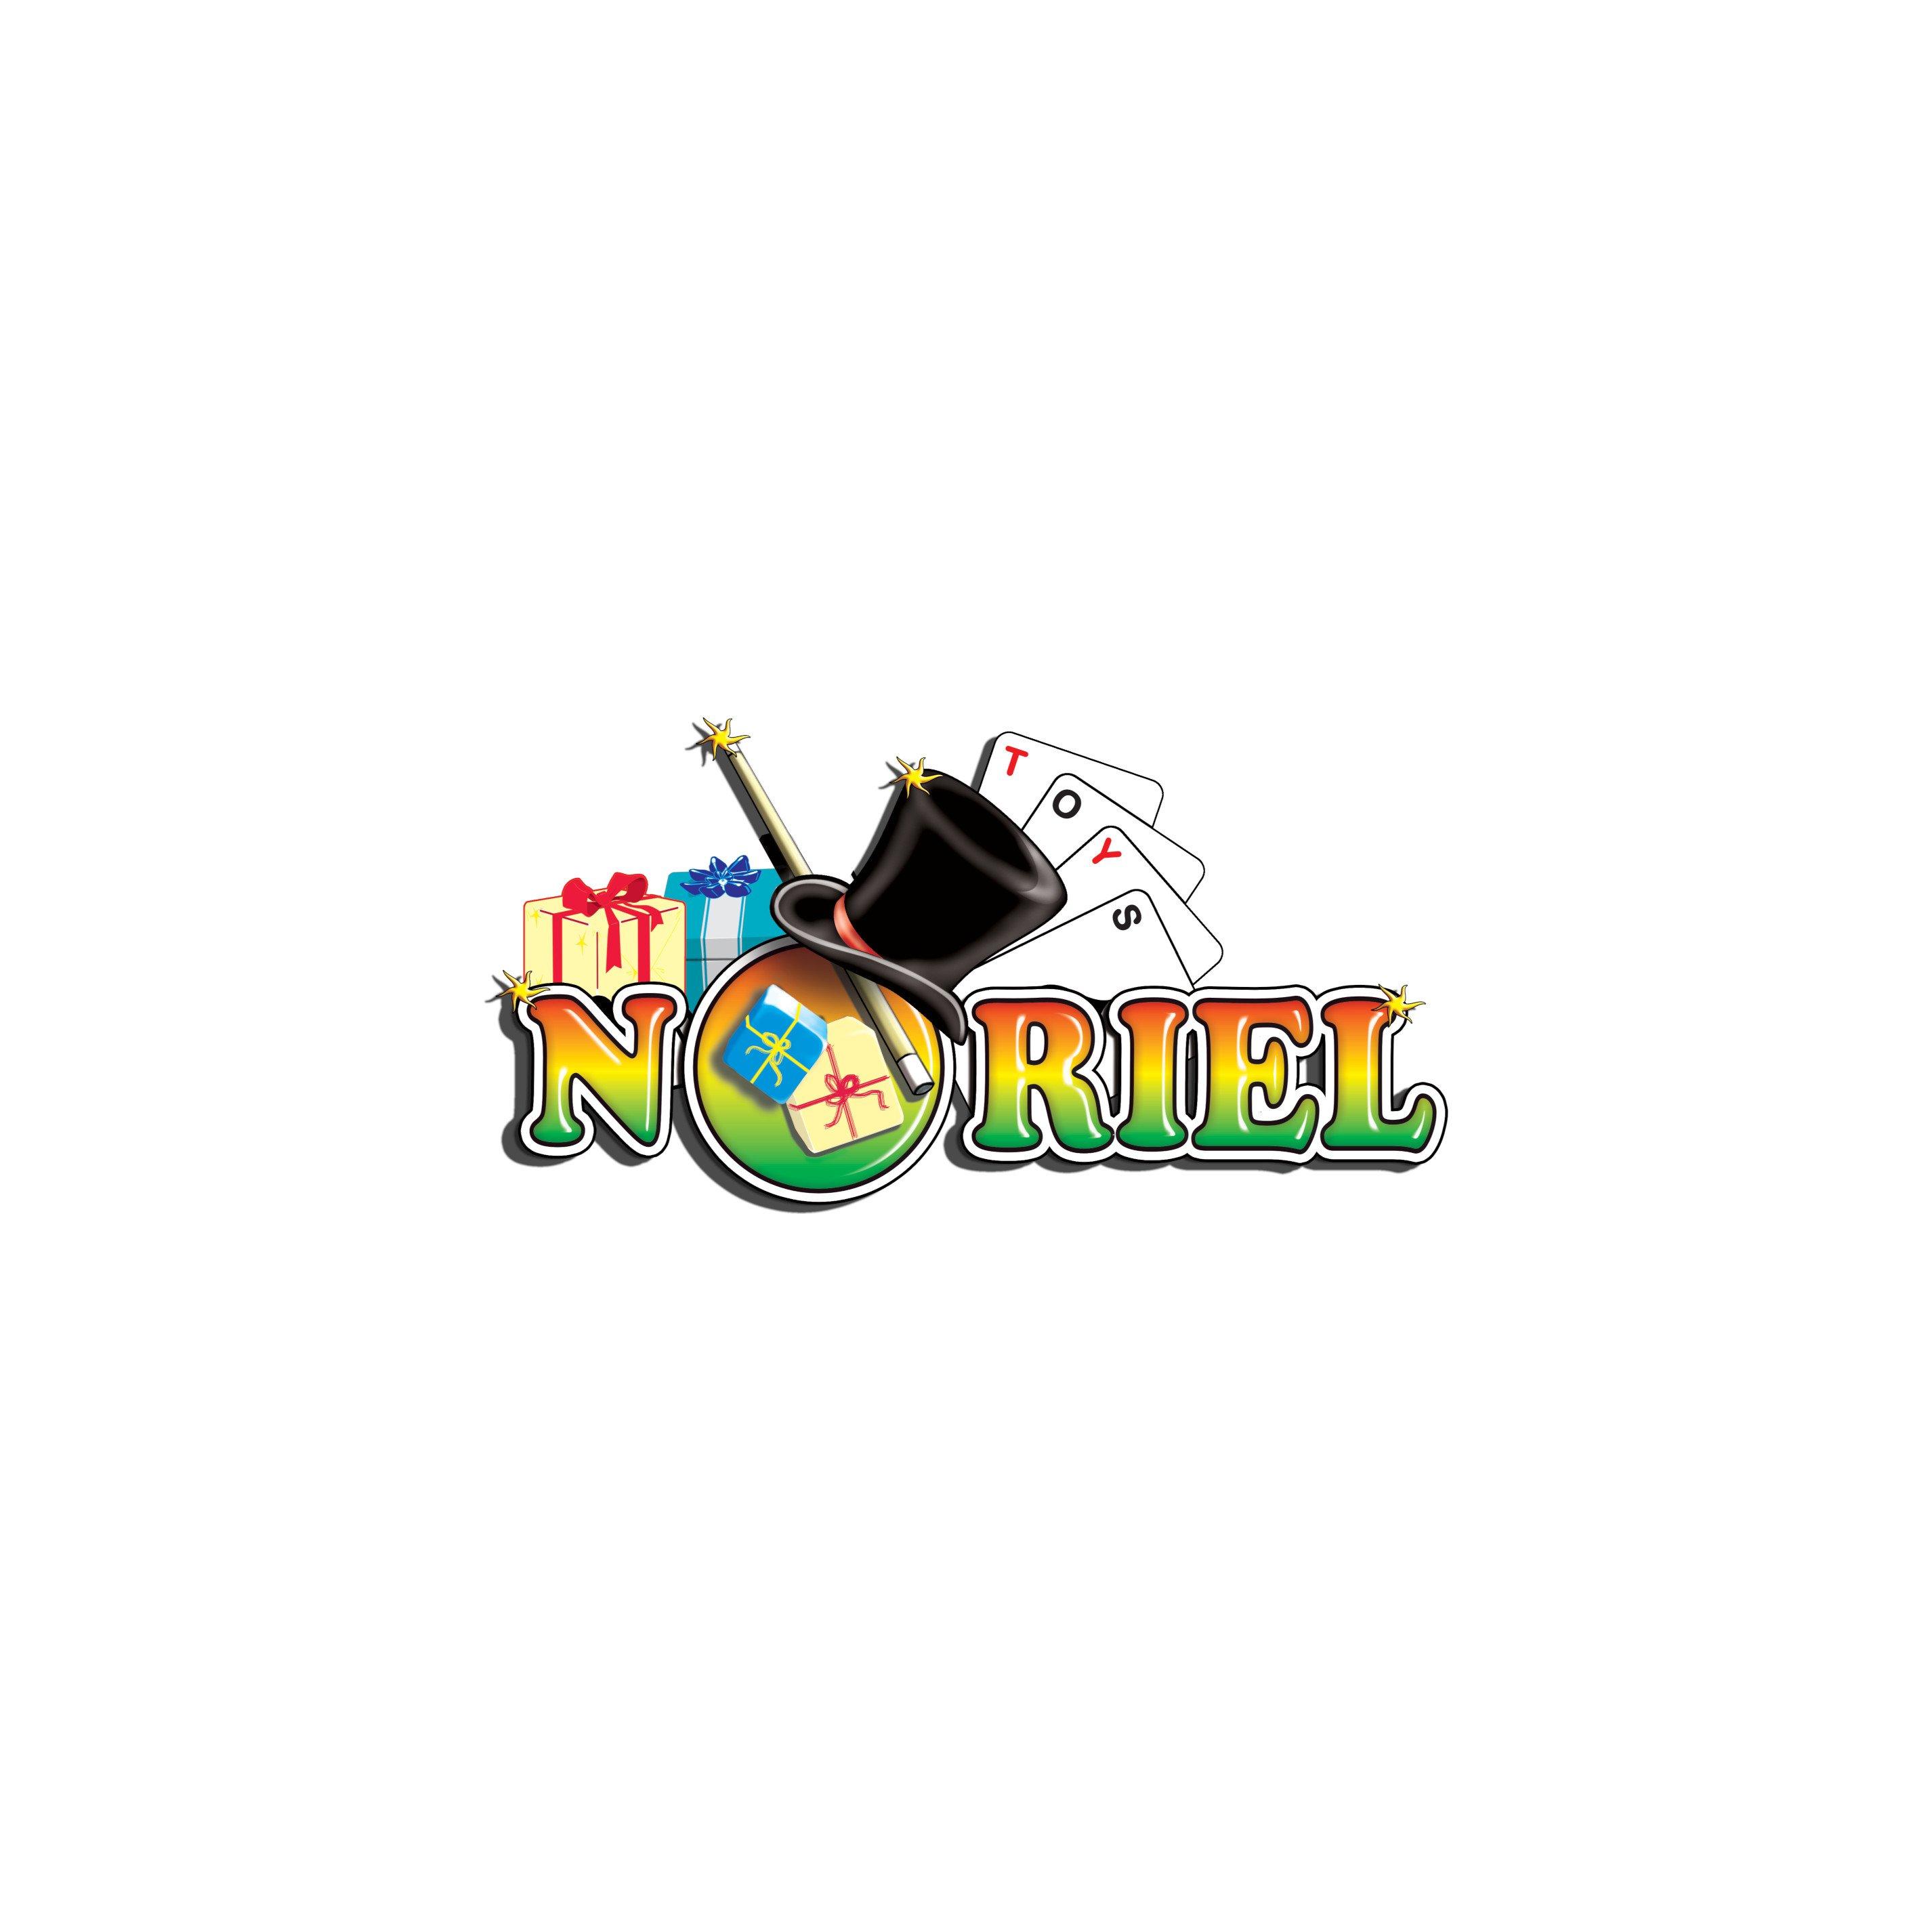 20191019N Set lenjerie de fete cu imprimeu Minnie Mouse, Negru